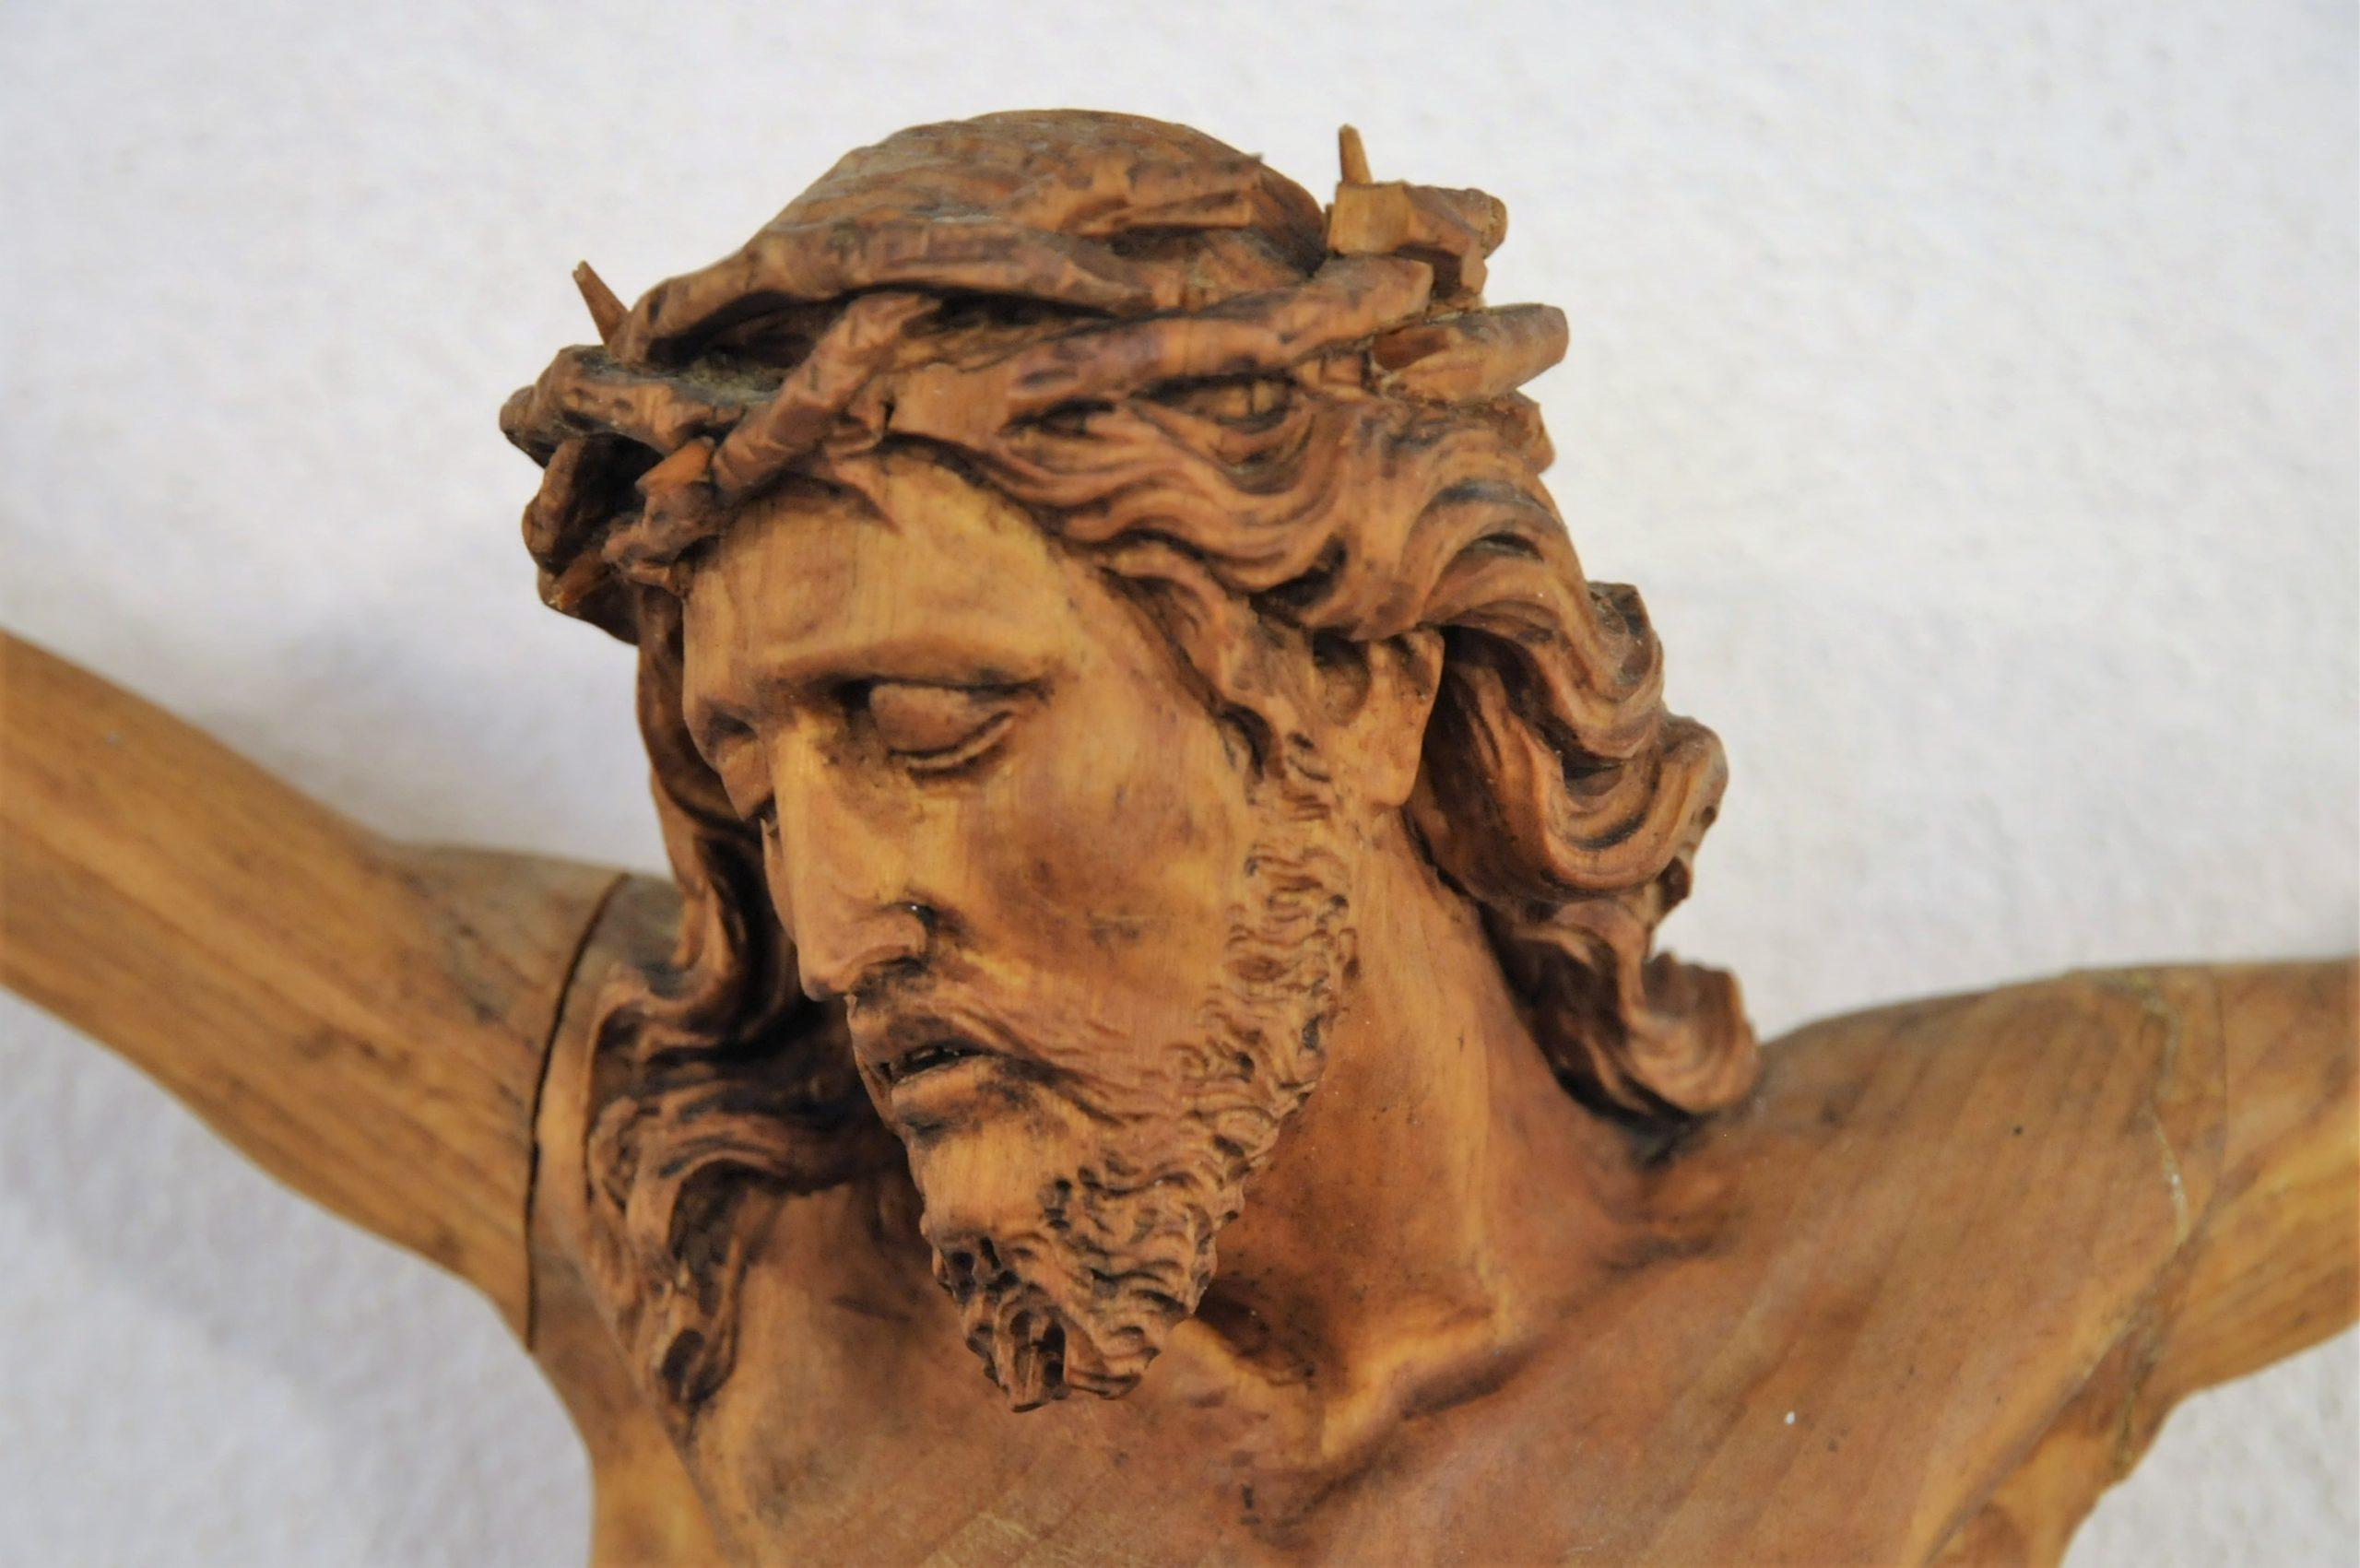 Jesus - Good Friday